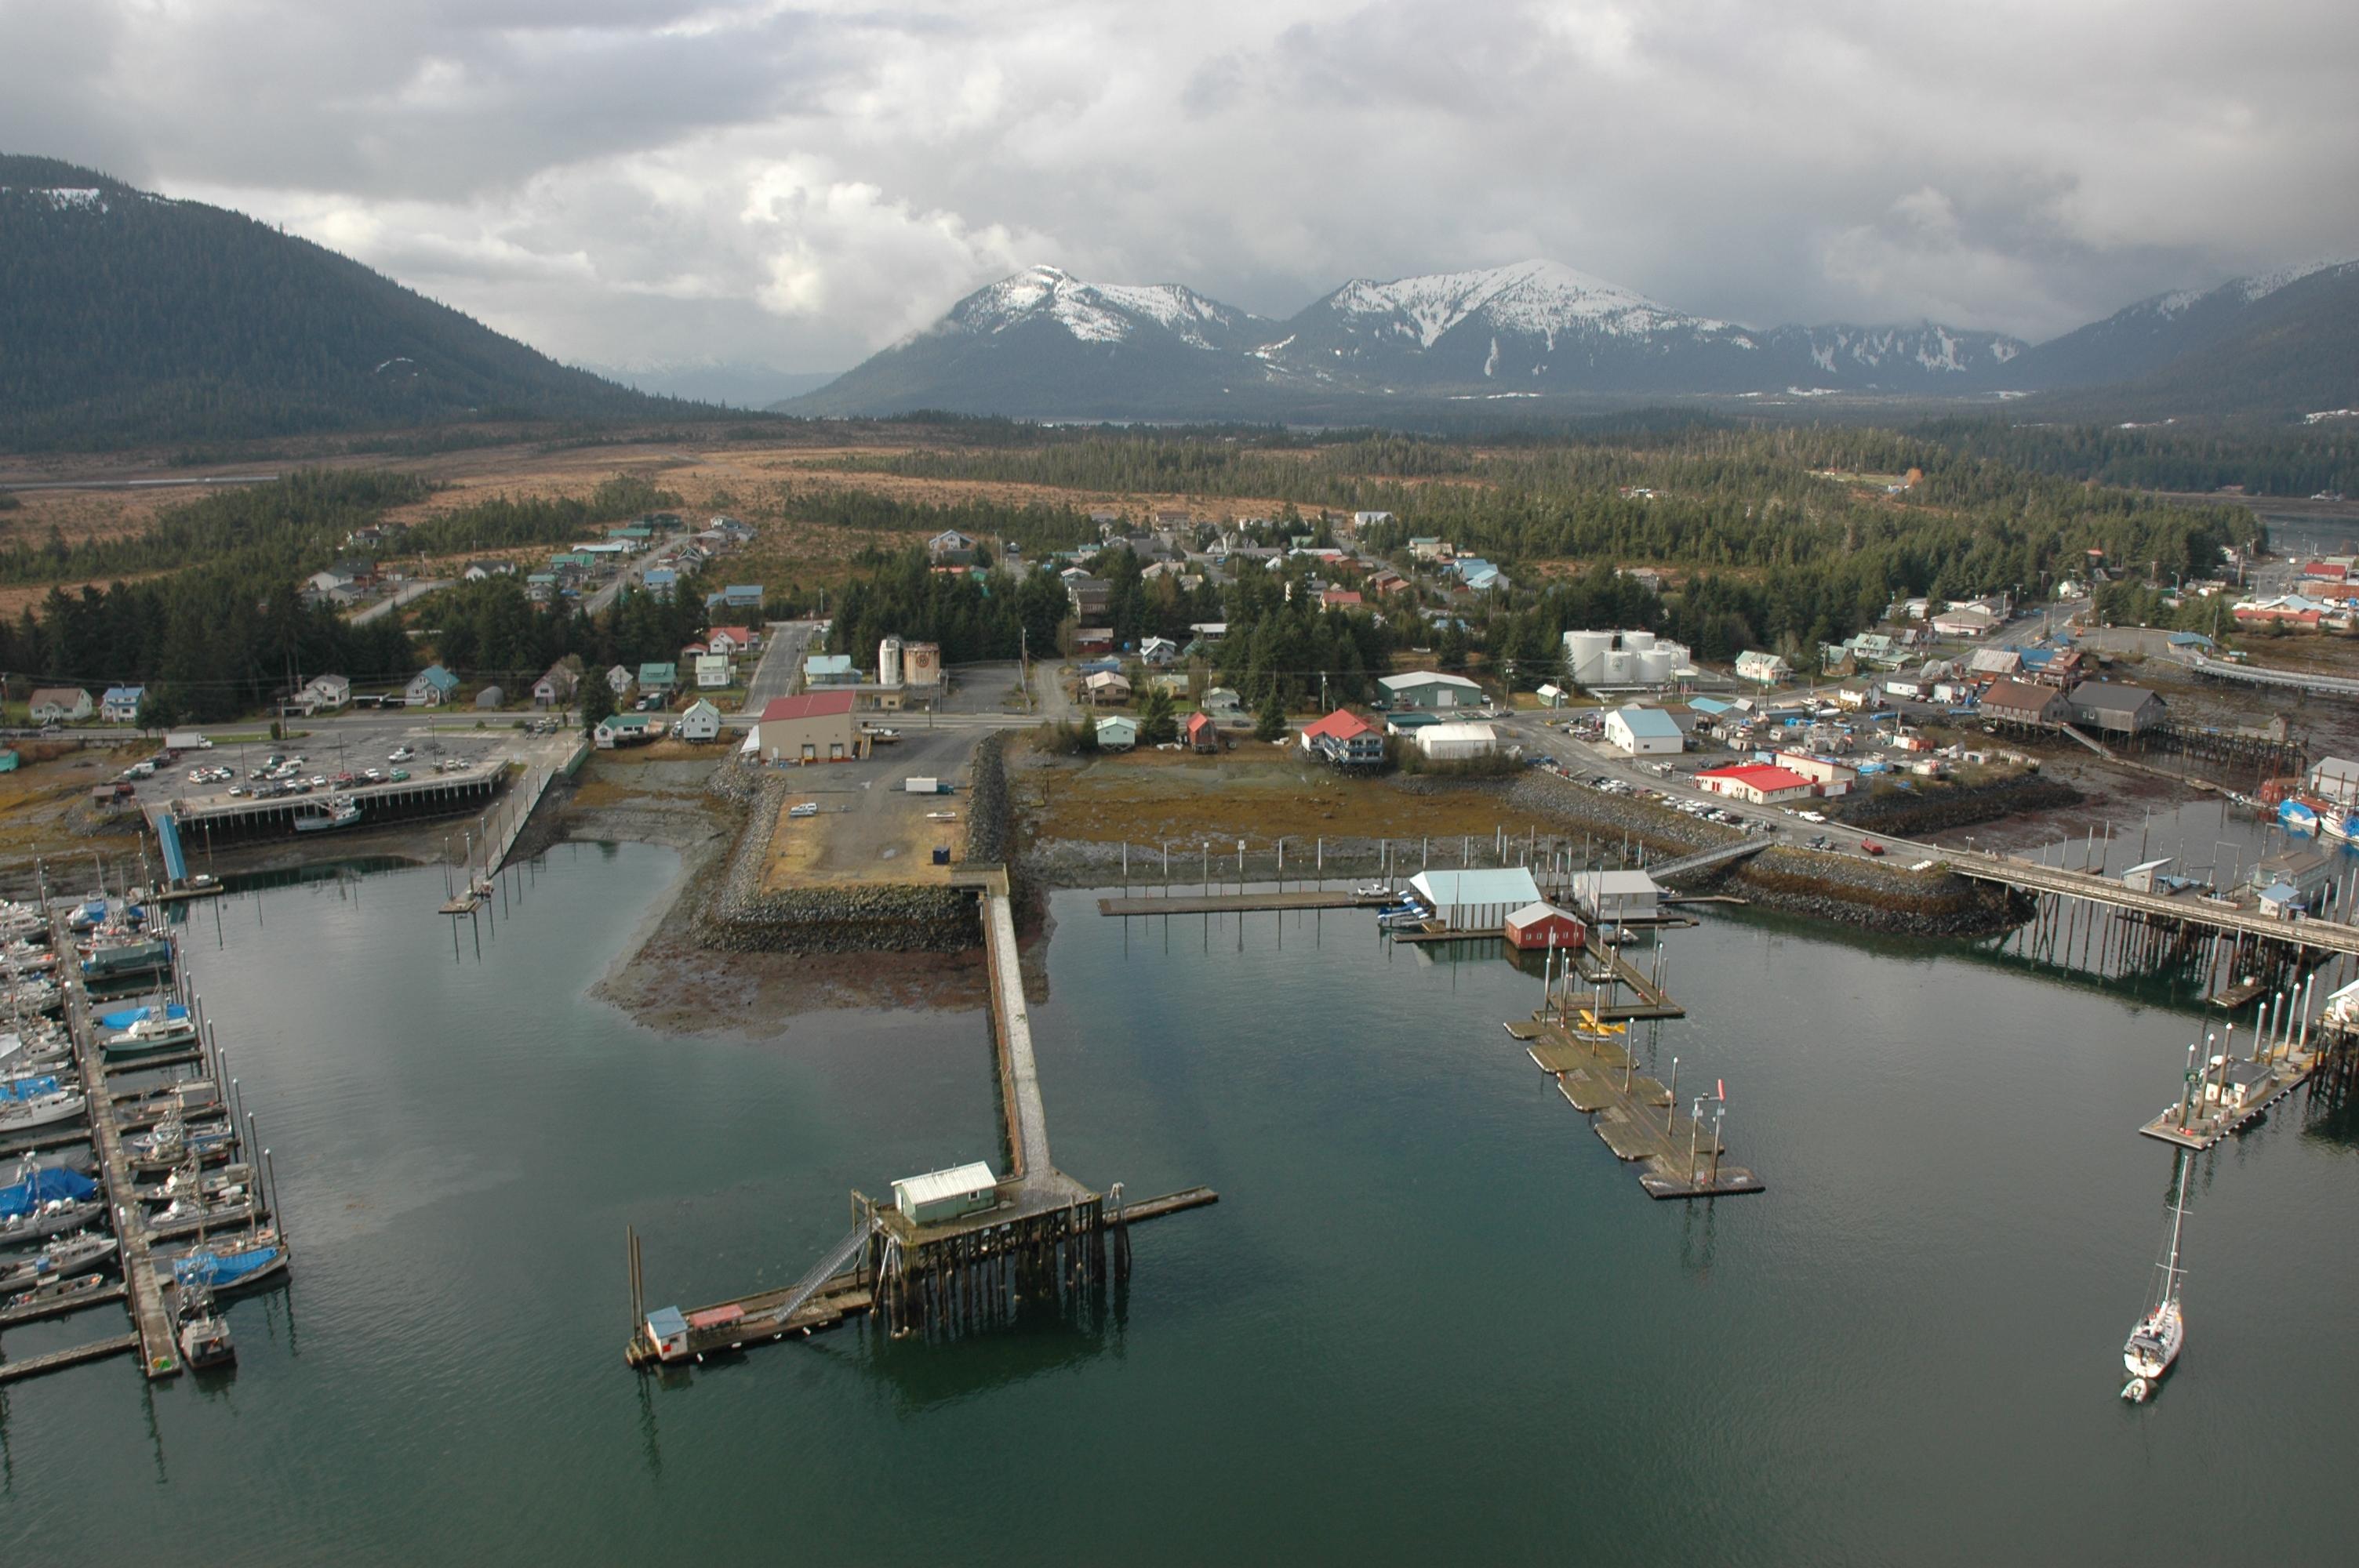 Despite loss, coastal program push goes on